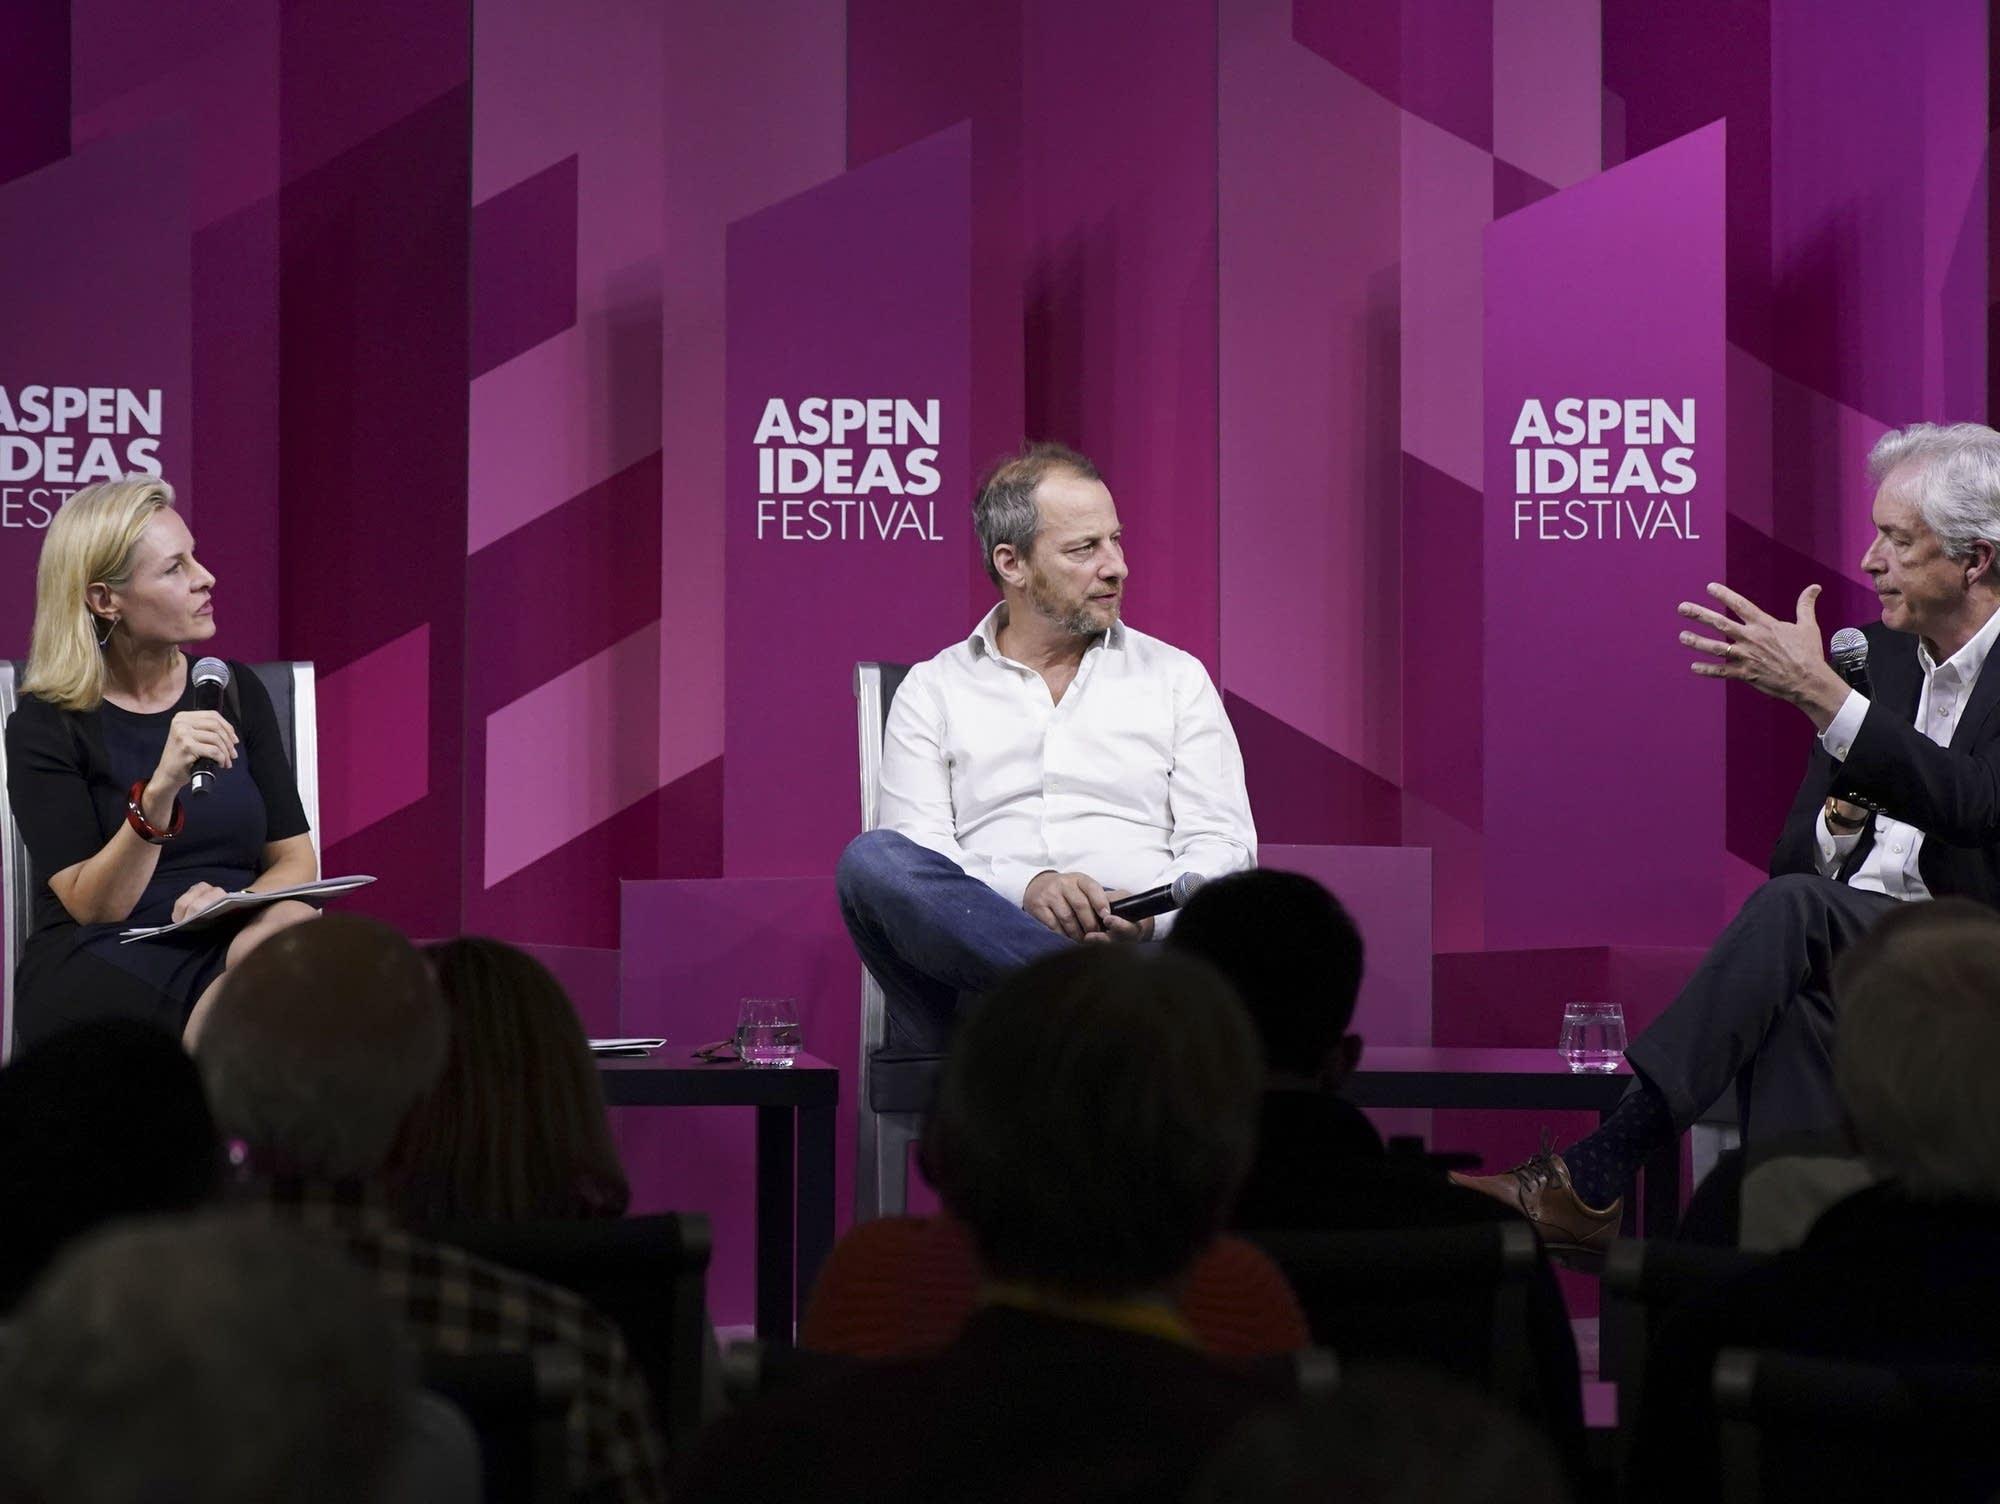 Aspen Ideas Festival 2020.2019 Aspen Ideas Festival Is Diplomacy Dead Mpr News